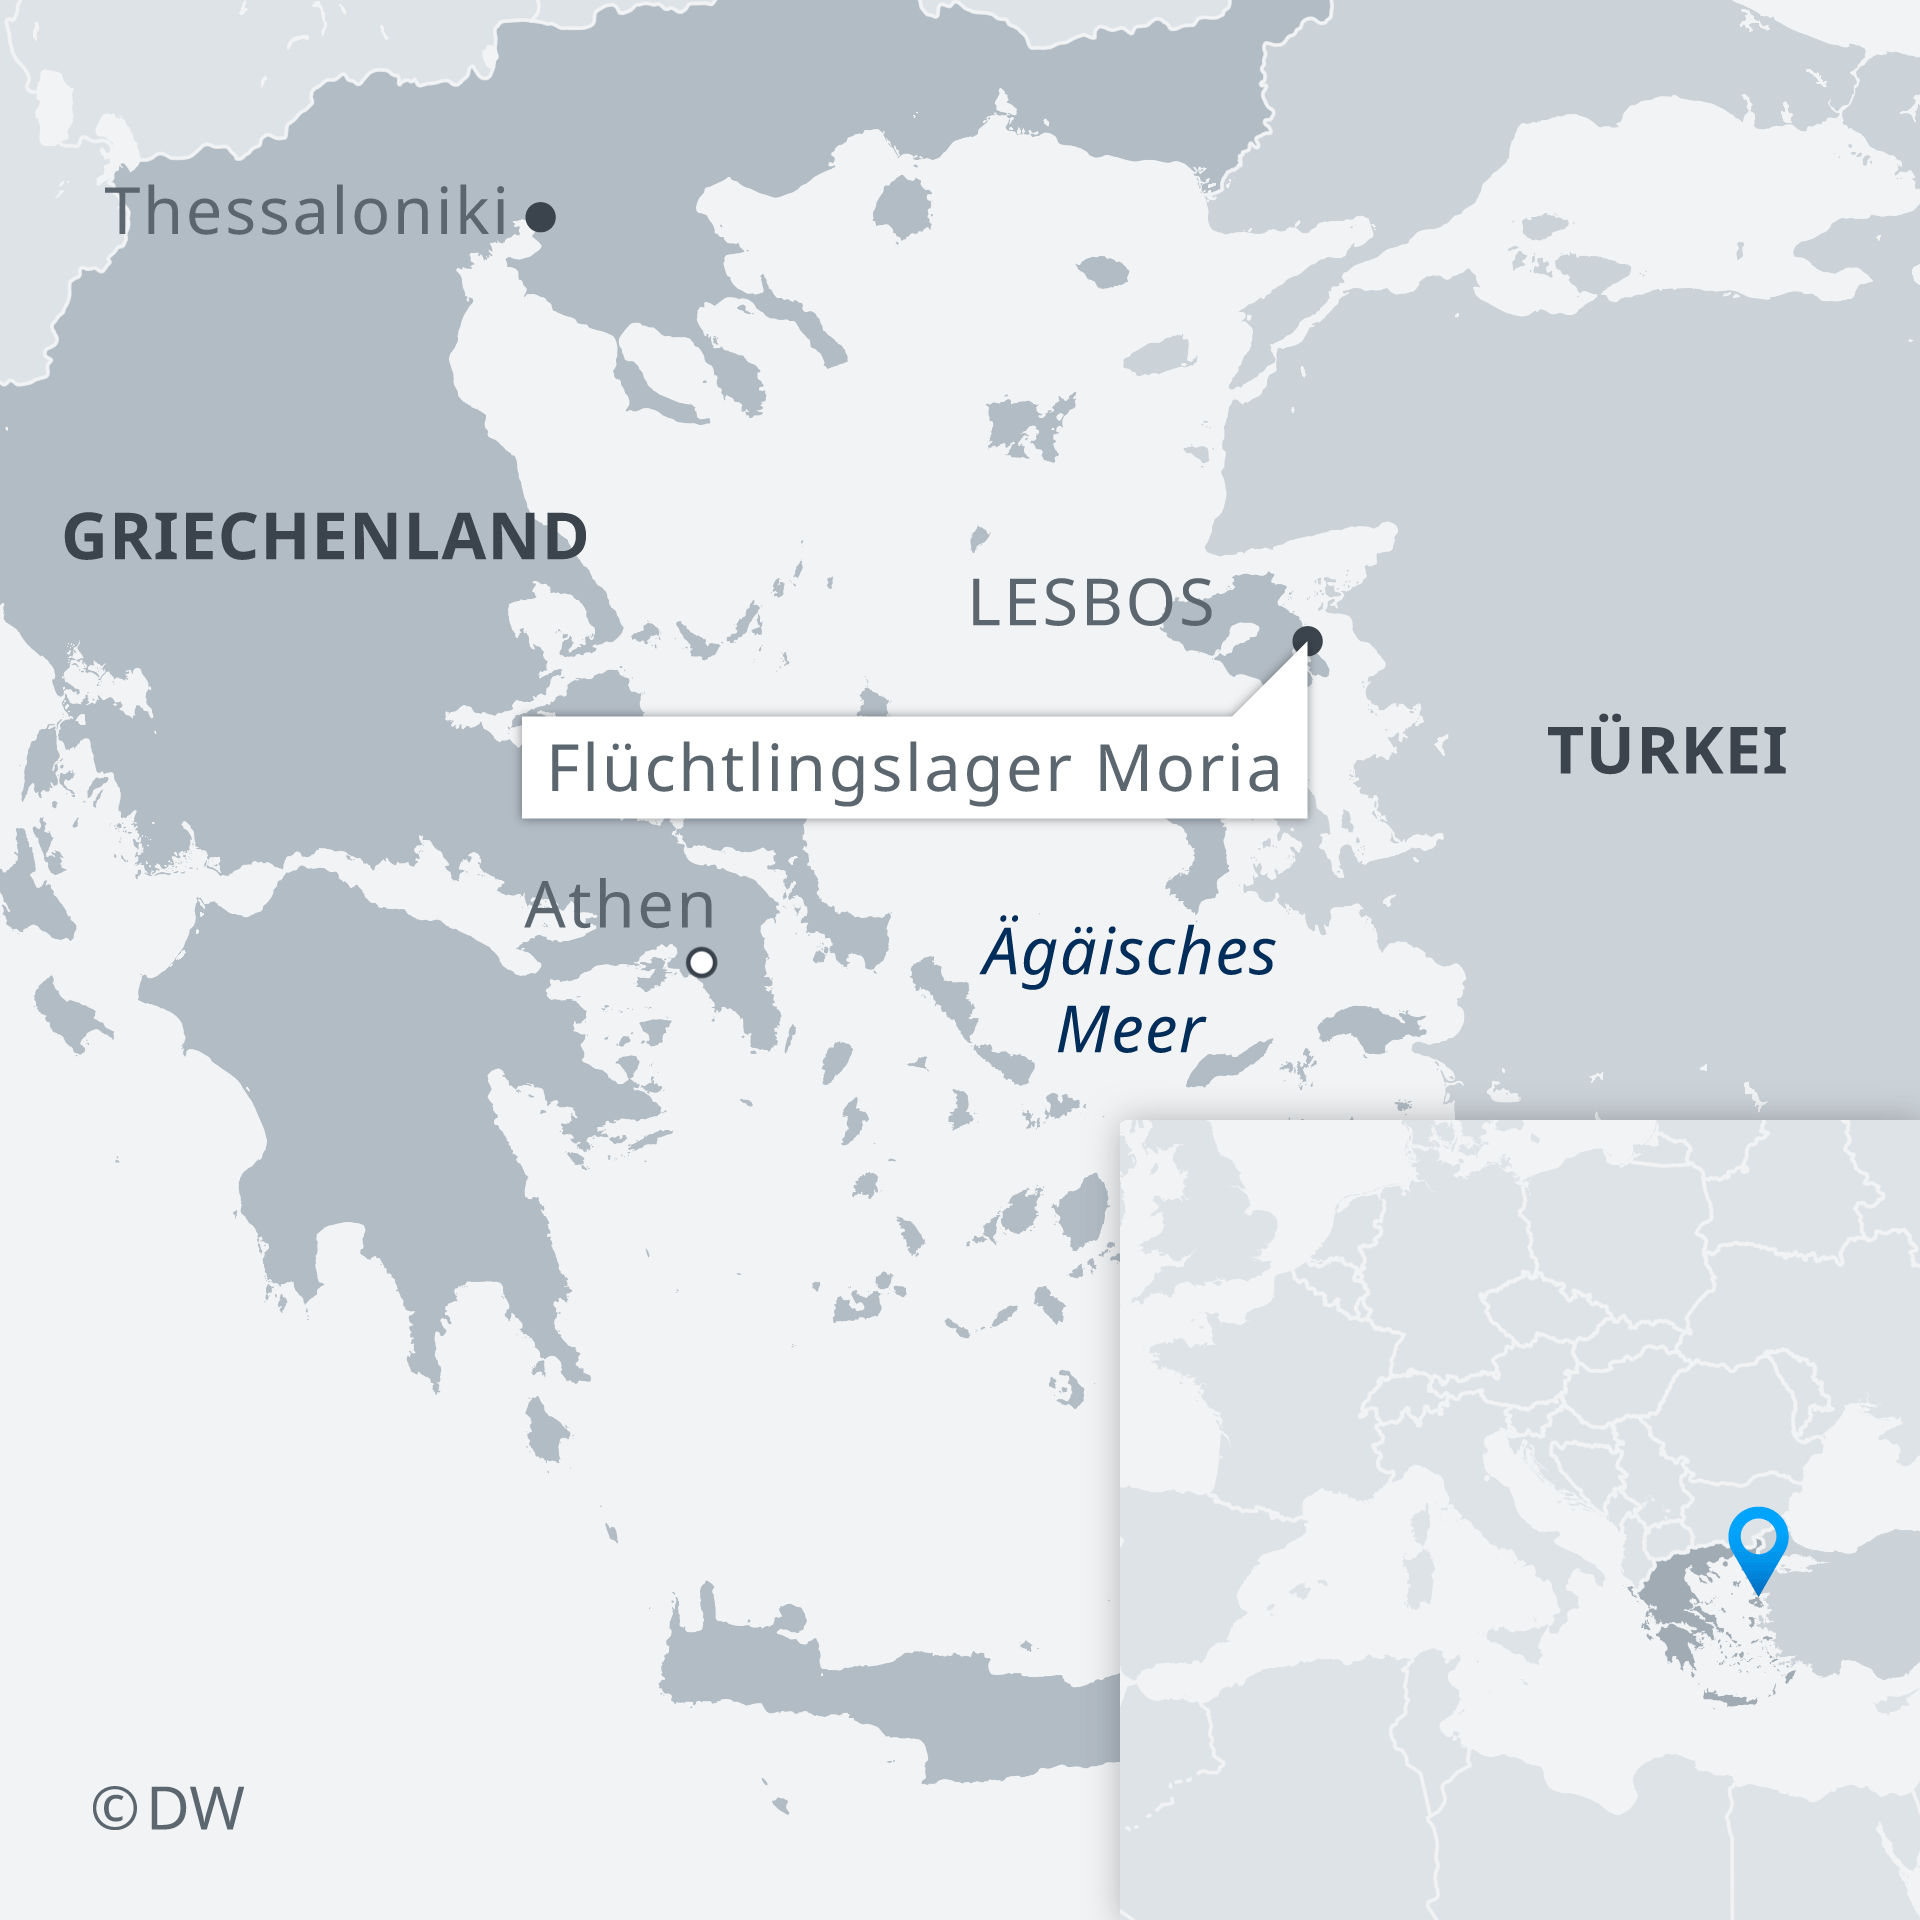 flüchtlingslager griechenland karte Flüchtlingslager Moria: Kontrollverlust in der Ägäis | Europa | DW